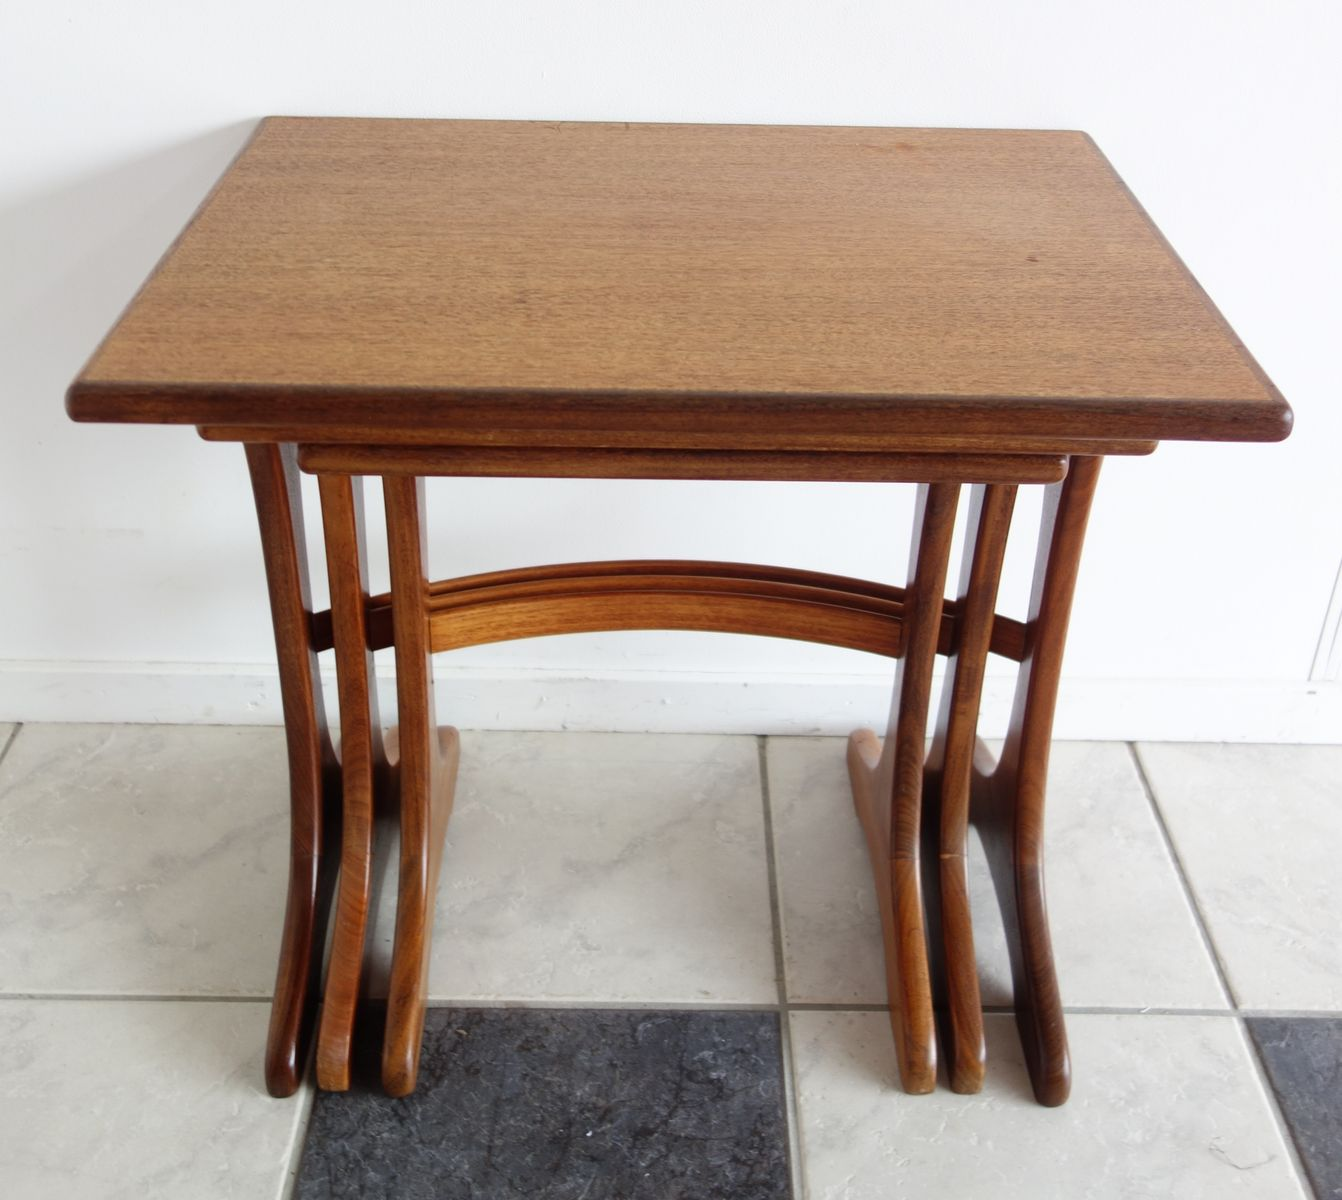 Fresco Teak Nesting Tables By Victor Wilkins For G Plan 1960s